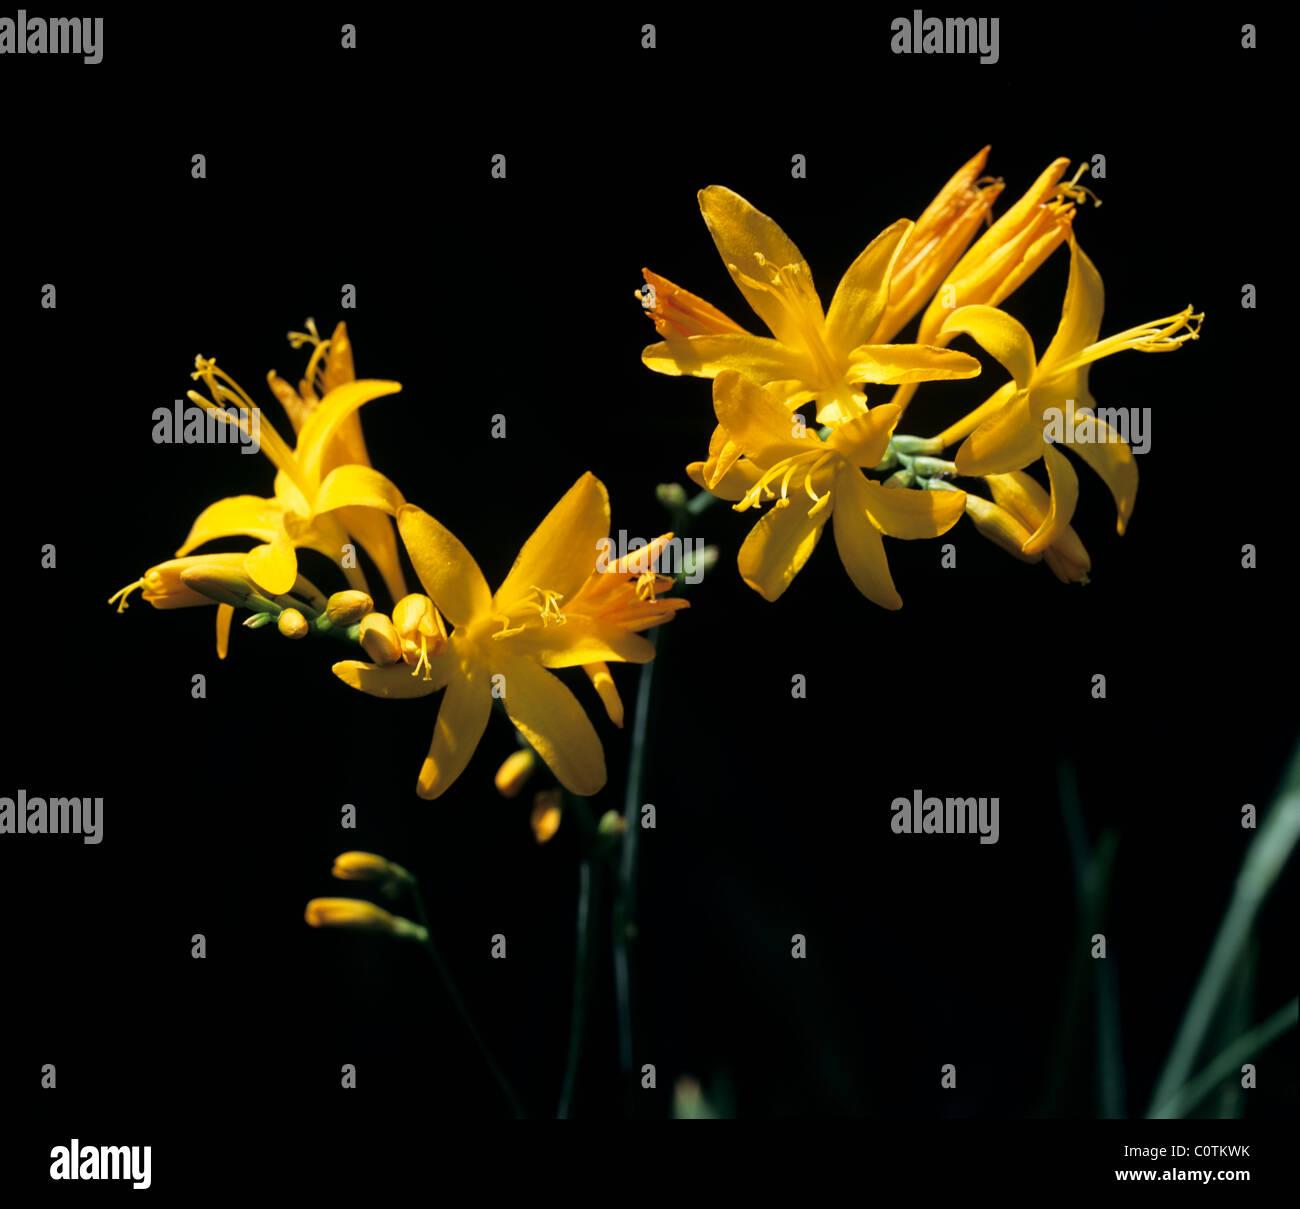 Flower spike of Crocosmia 'Irish Dawn' - Stock Image